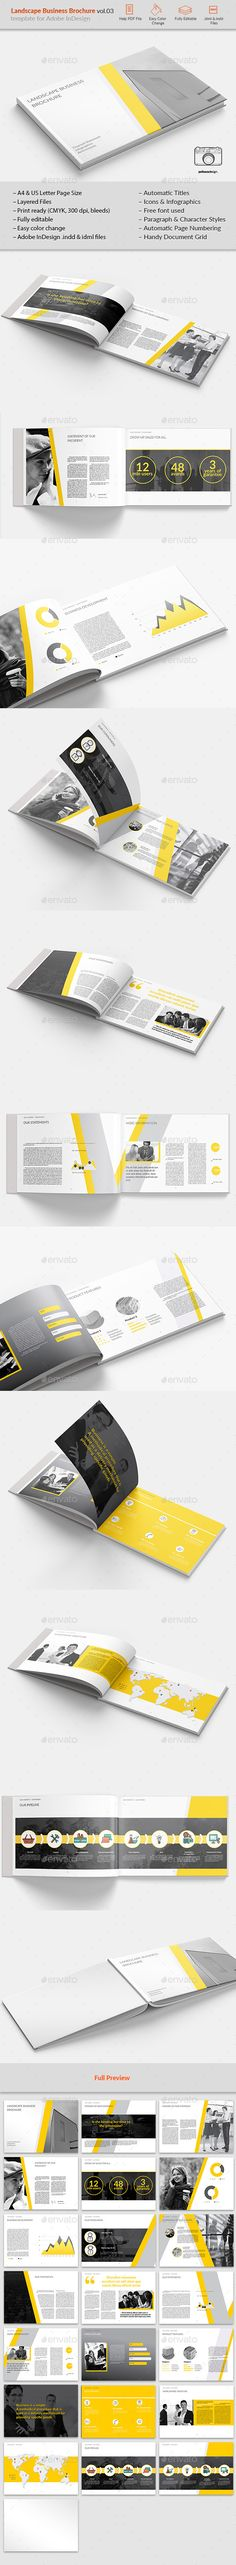 Landsape #Business #Brochure vol.03 - Brochures #Print Templates Download here: https://graphicriver.net/item/landsape-business-brochure-vol03/19751200?ref=alena994